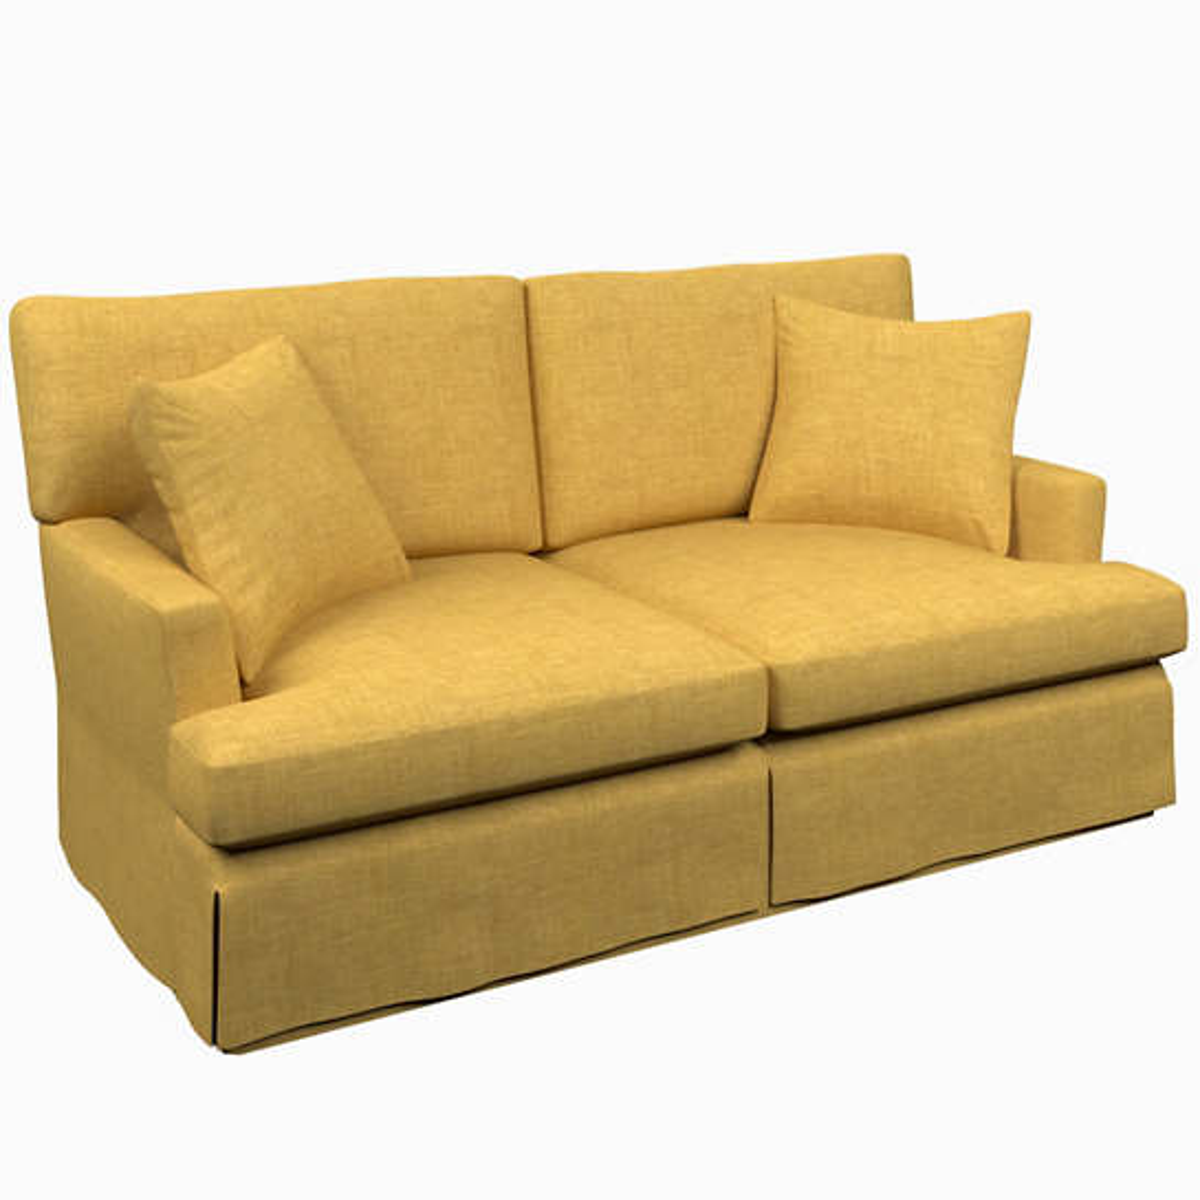 Greylock Gold Saybrook 2 Seater Slipcovered Sofa